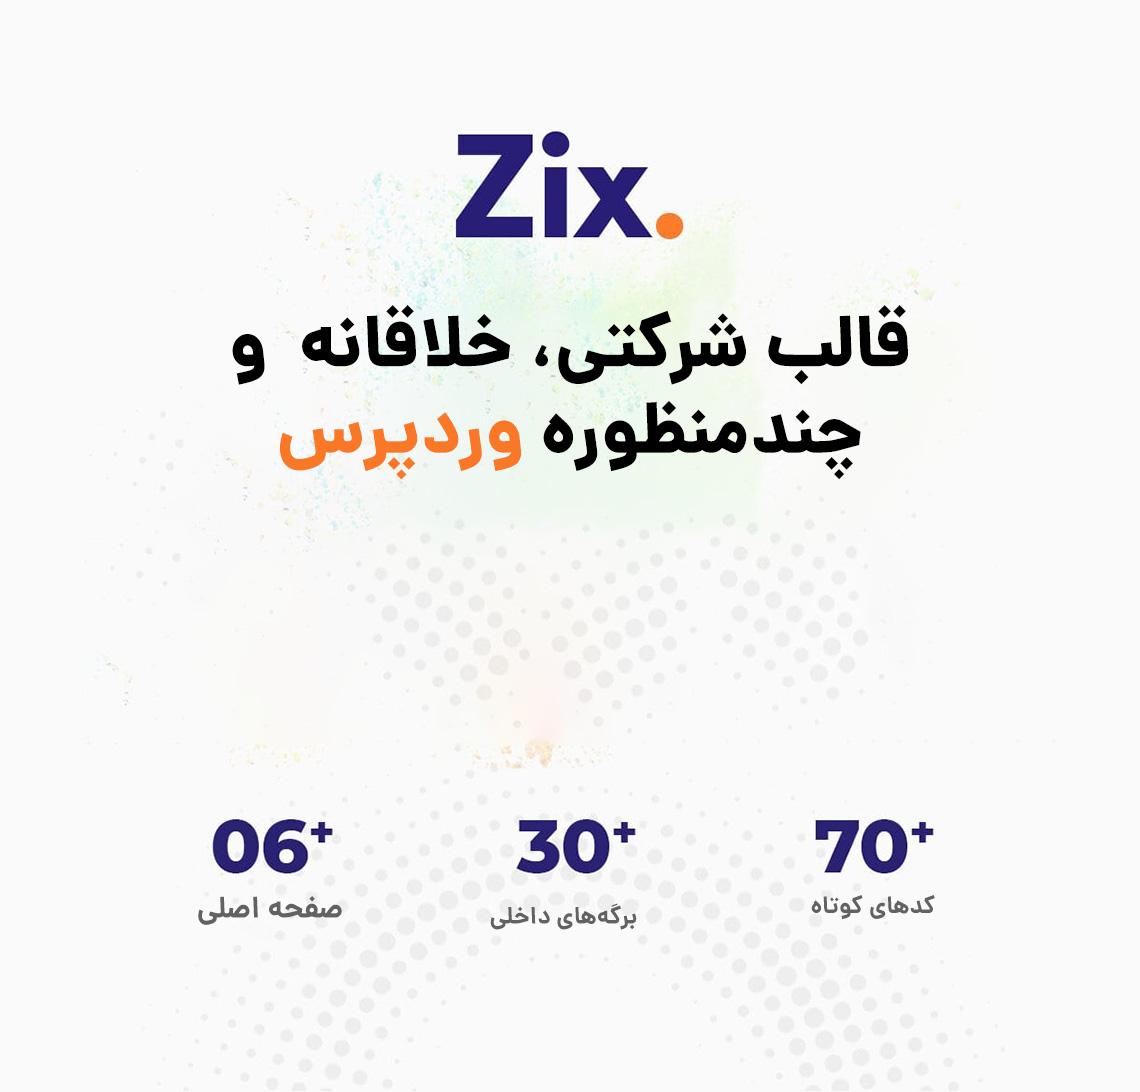 5001 ca98006c975f46f47145ebbc8 - قالب Zix، پوسته وردپرس چند منظوره و شرکتی مارکتینگ زیکس